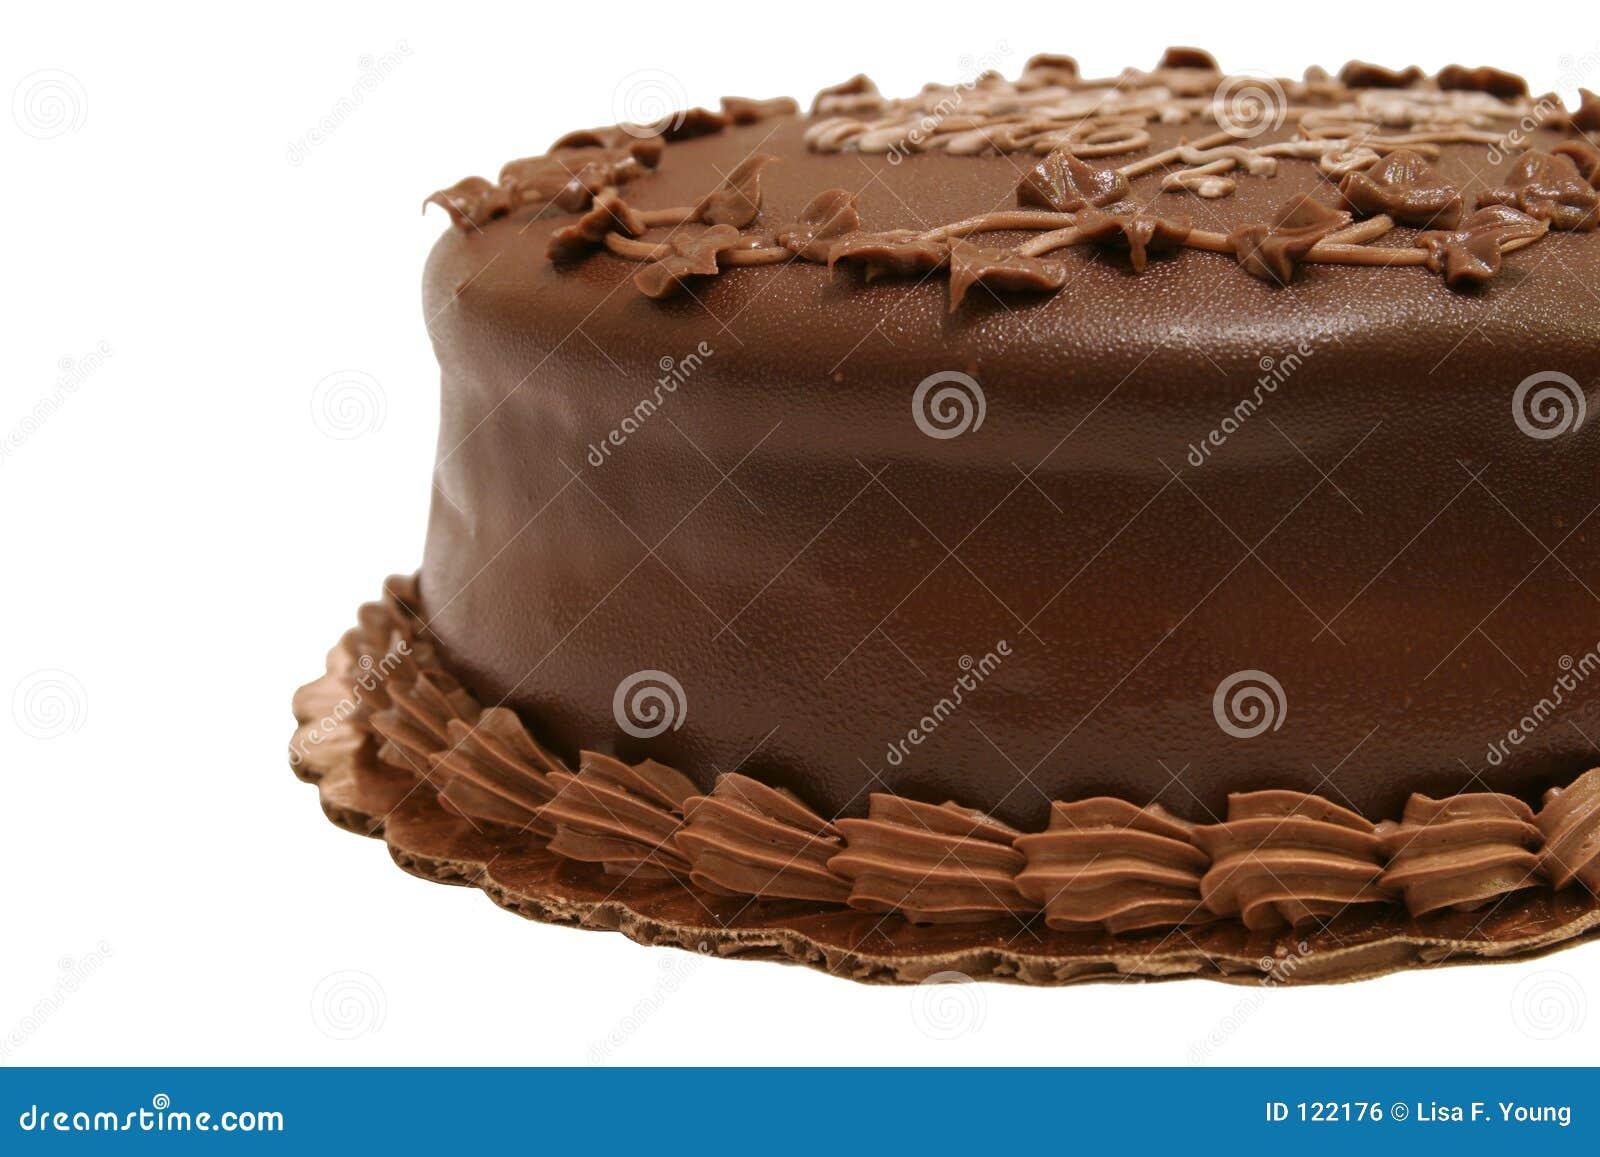 Chocolate Cake - Partial 2